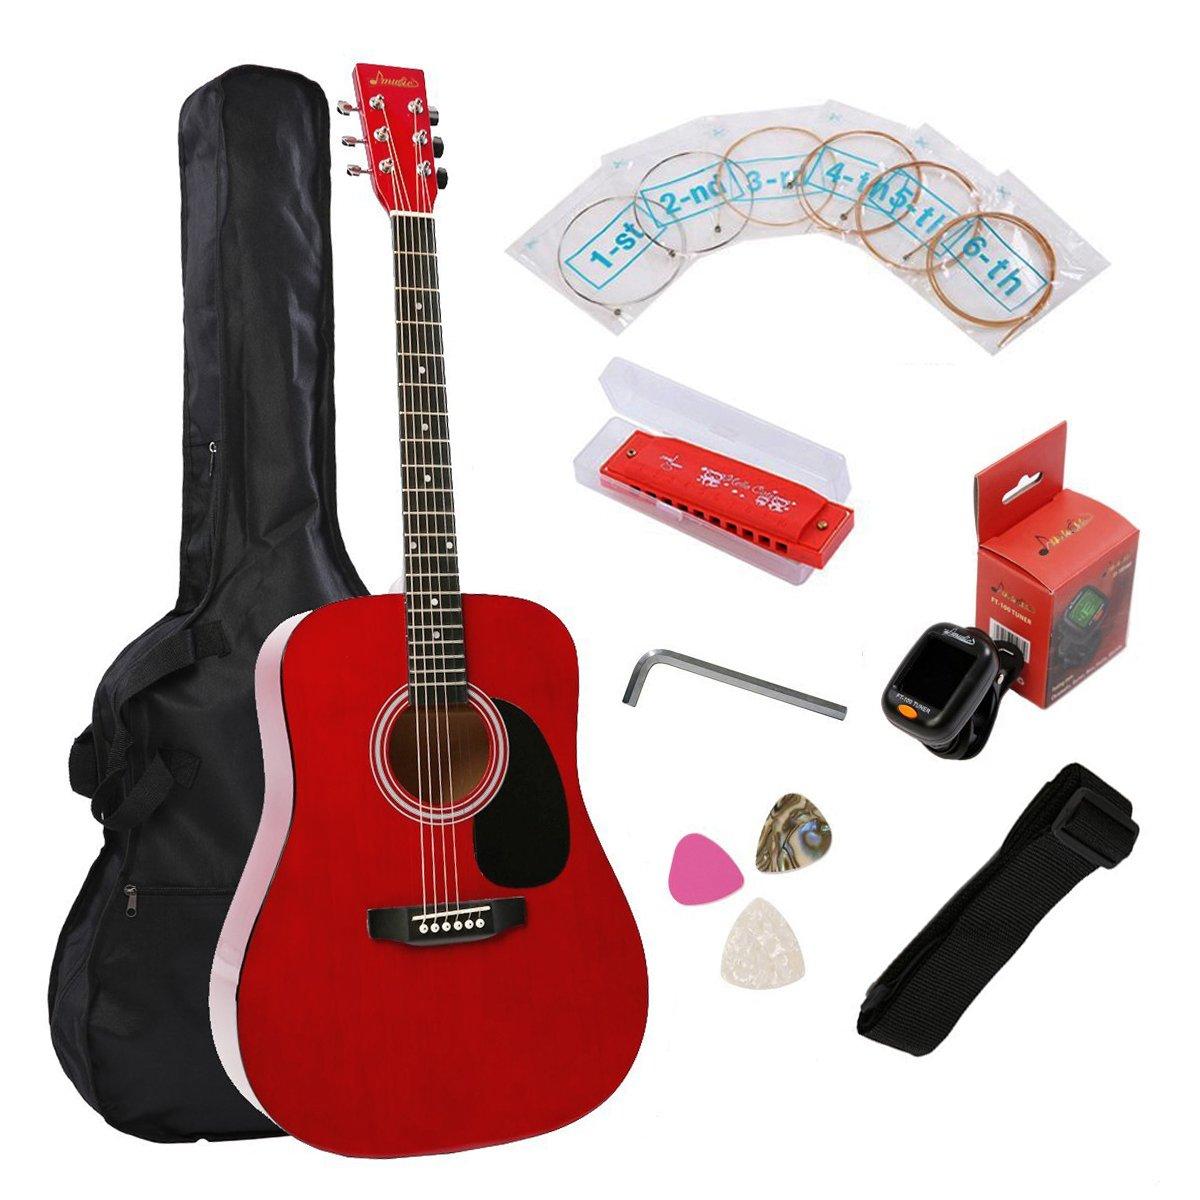 Full Size Acoustic Guitar Music 41 Inch Dreadnought Guitar Starter Kit - Gloss Red